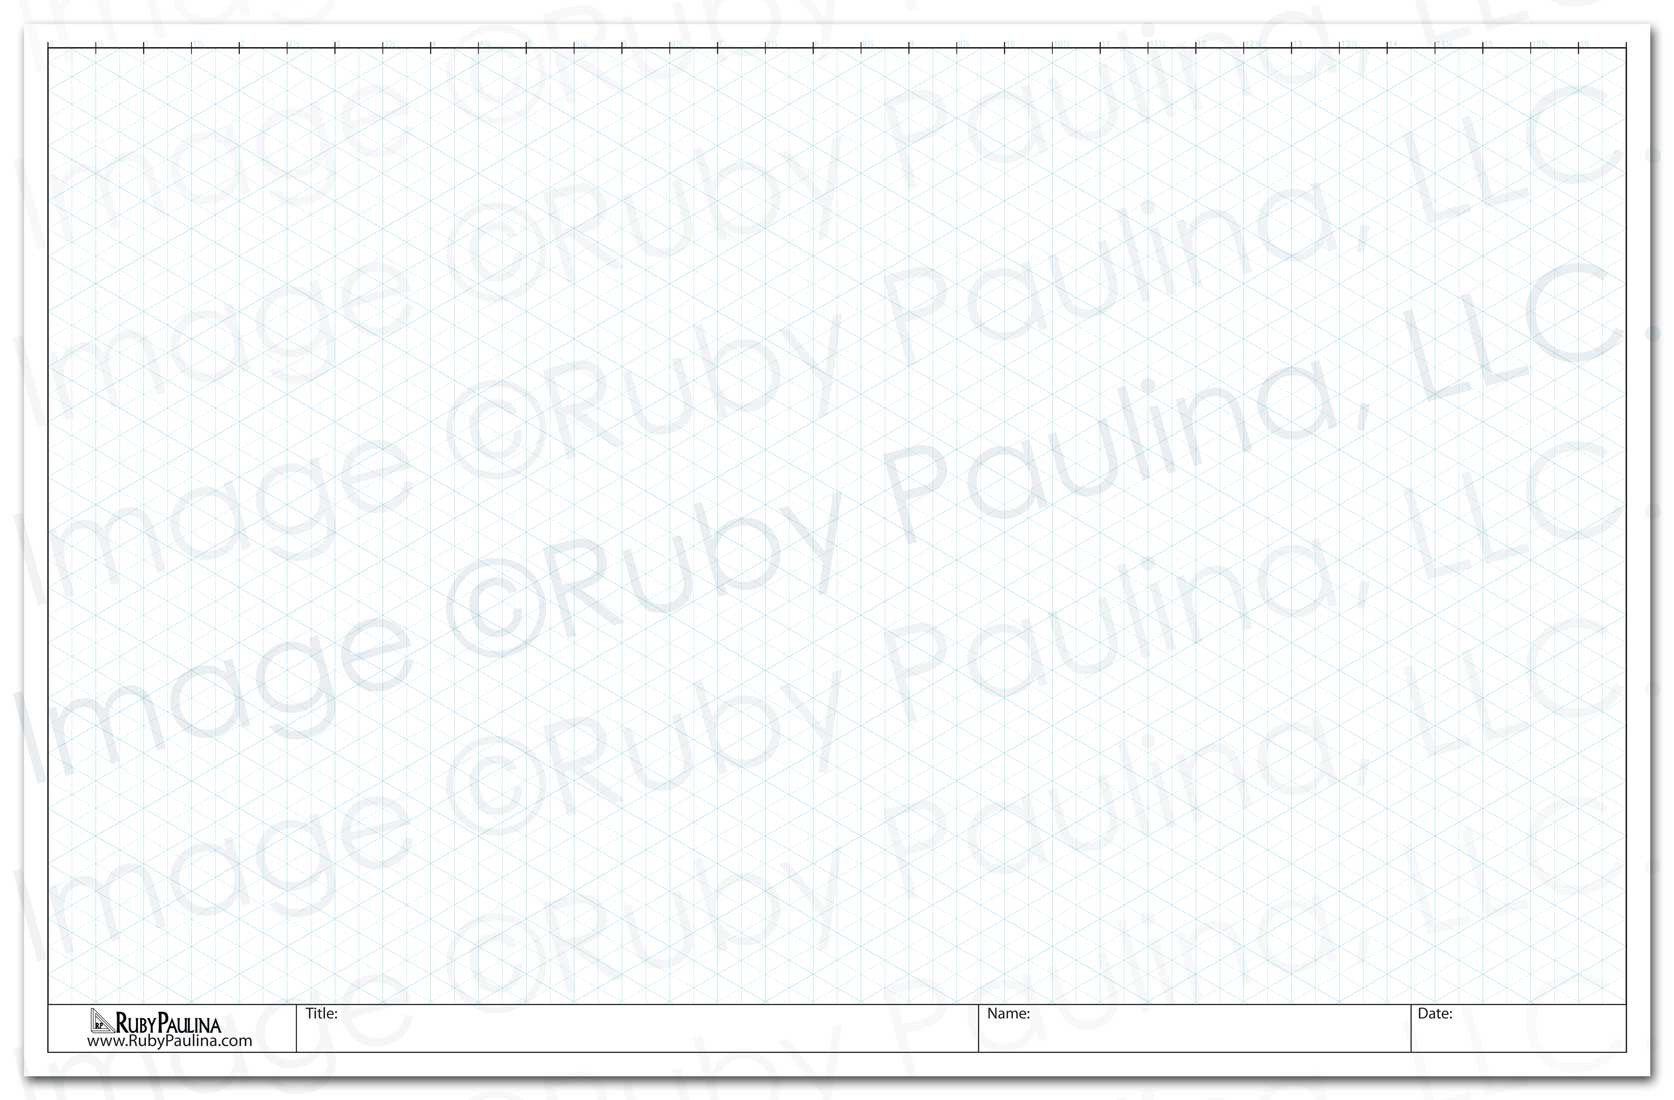 11x17 Loose Leaf Isometric Paper, White (579180) by Ruby Paulina LLC